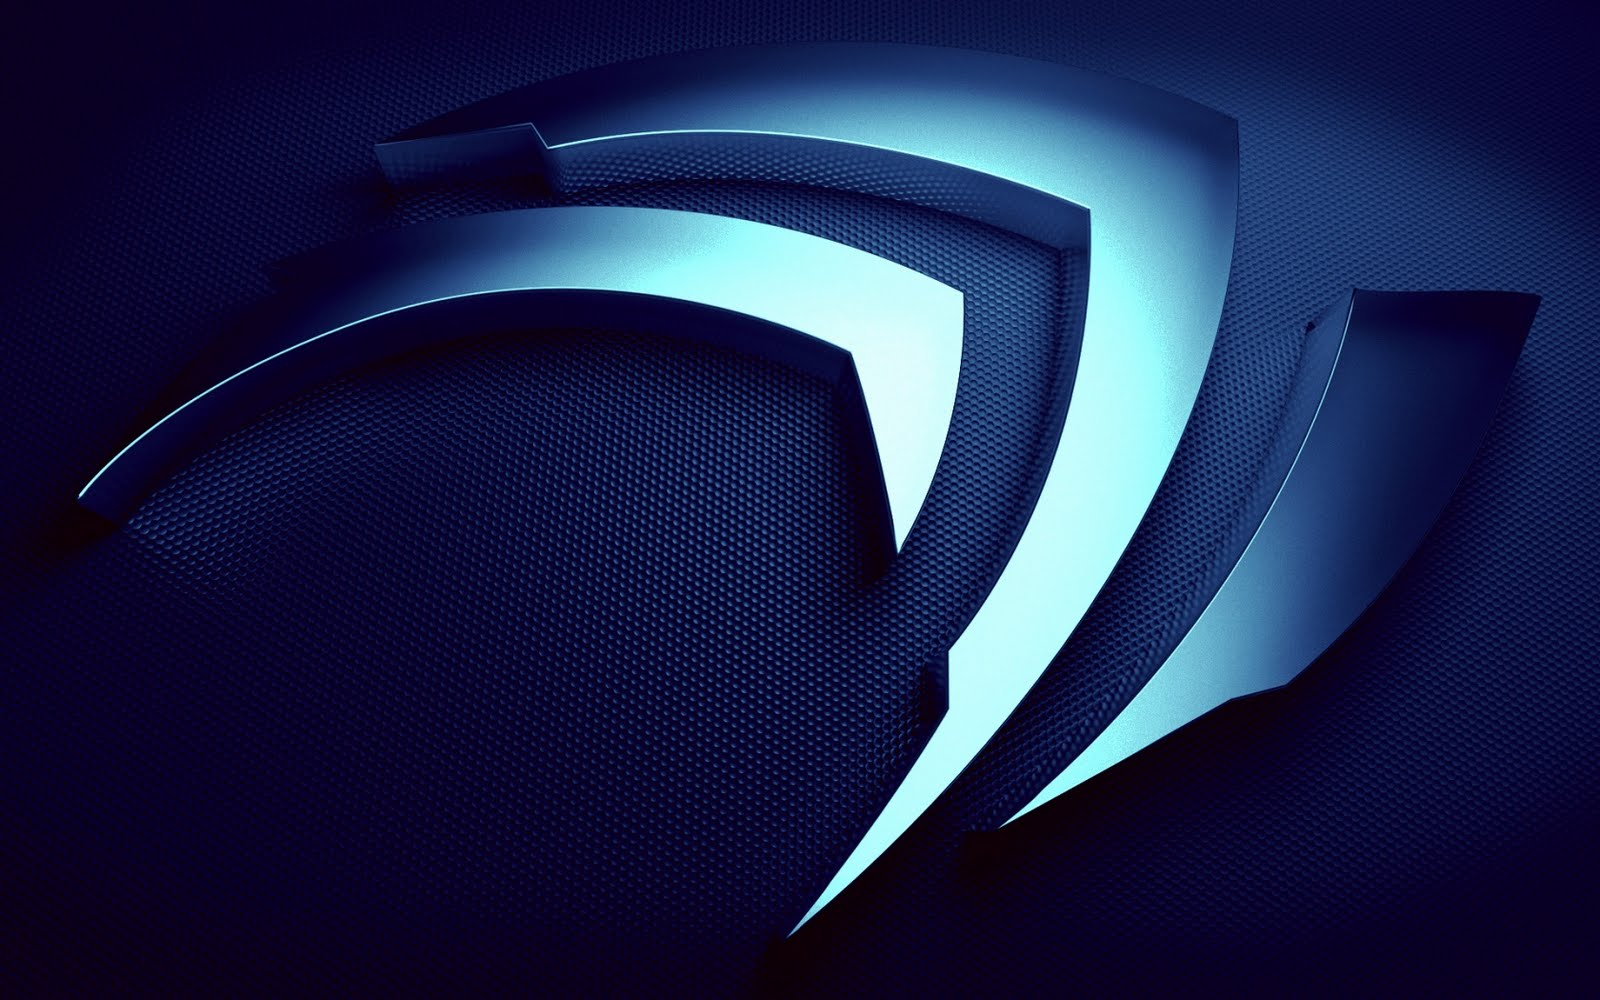 http://3.bp.blogspot.com/_Ym3du2sG3R4/TQ-gFJBRaCI/AAAAAAAADEk/Nw1i3fh64Hg/s1600/nvidia-logo-Blue-wallpaper-1680x1050.jpg